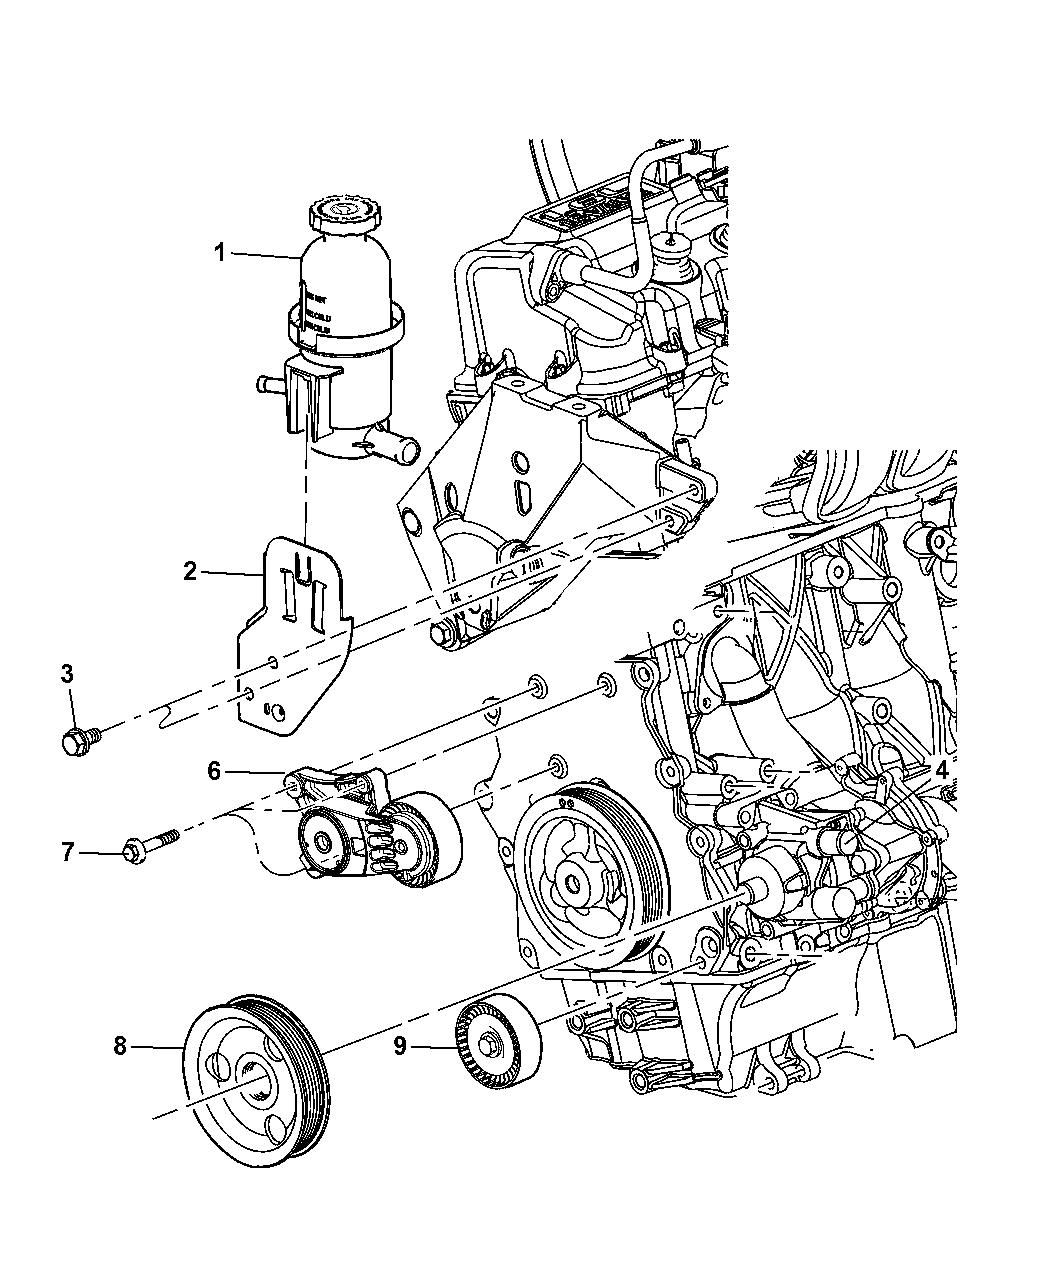 2007 Chrysler PT Cruiser Pump Assembly & Mounting - Thumbnail 1